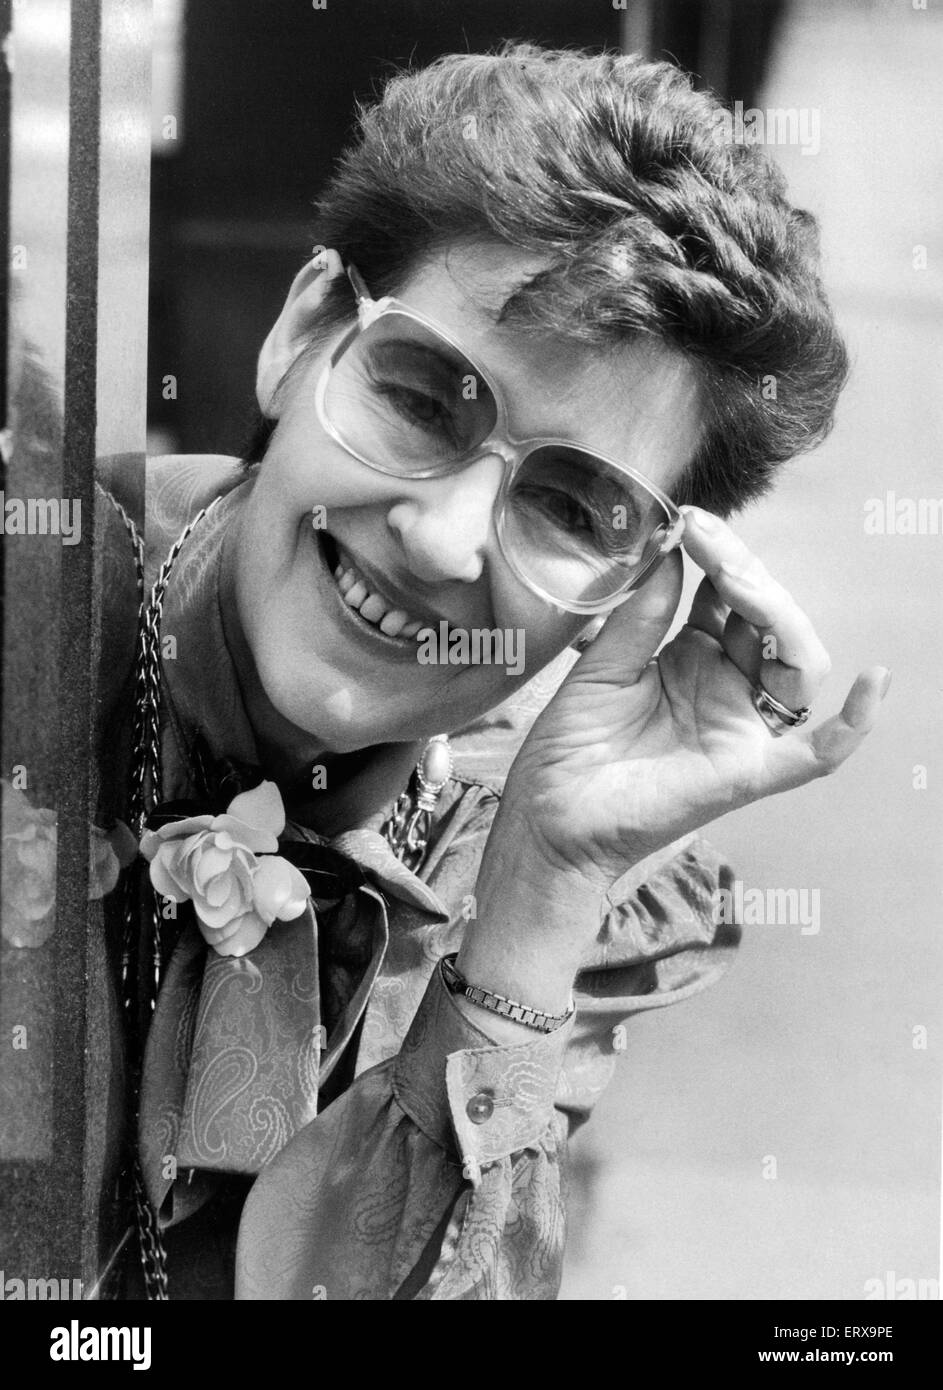 Birmingham Mail fashion editor Barbara Henderson. July 1986. - Stock Image